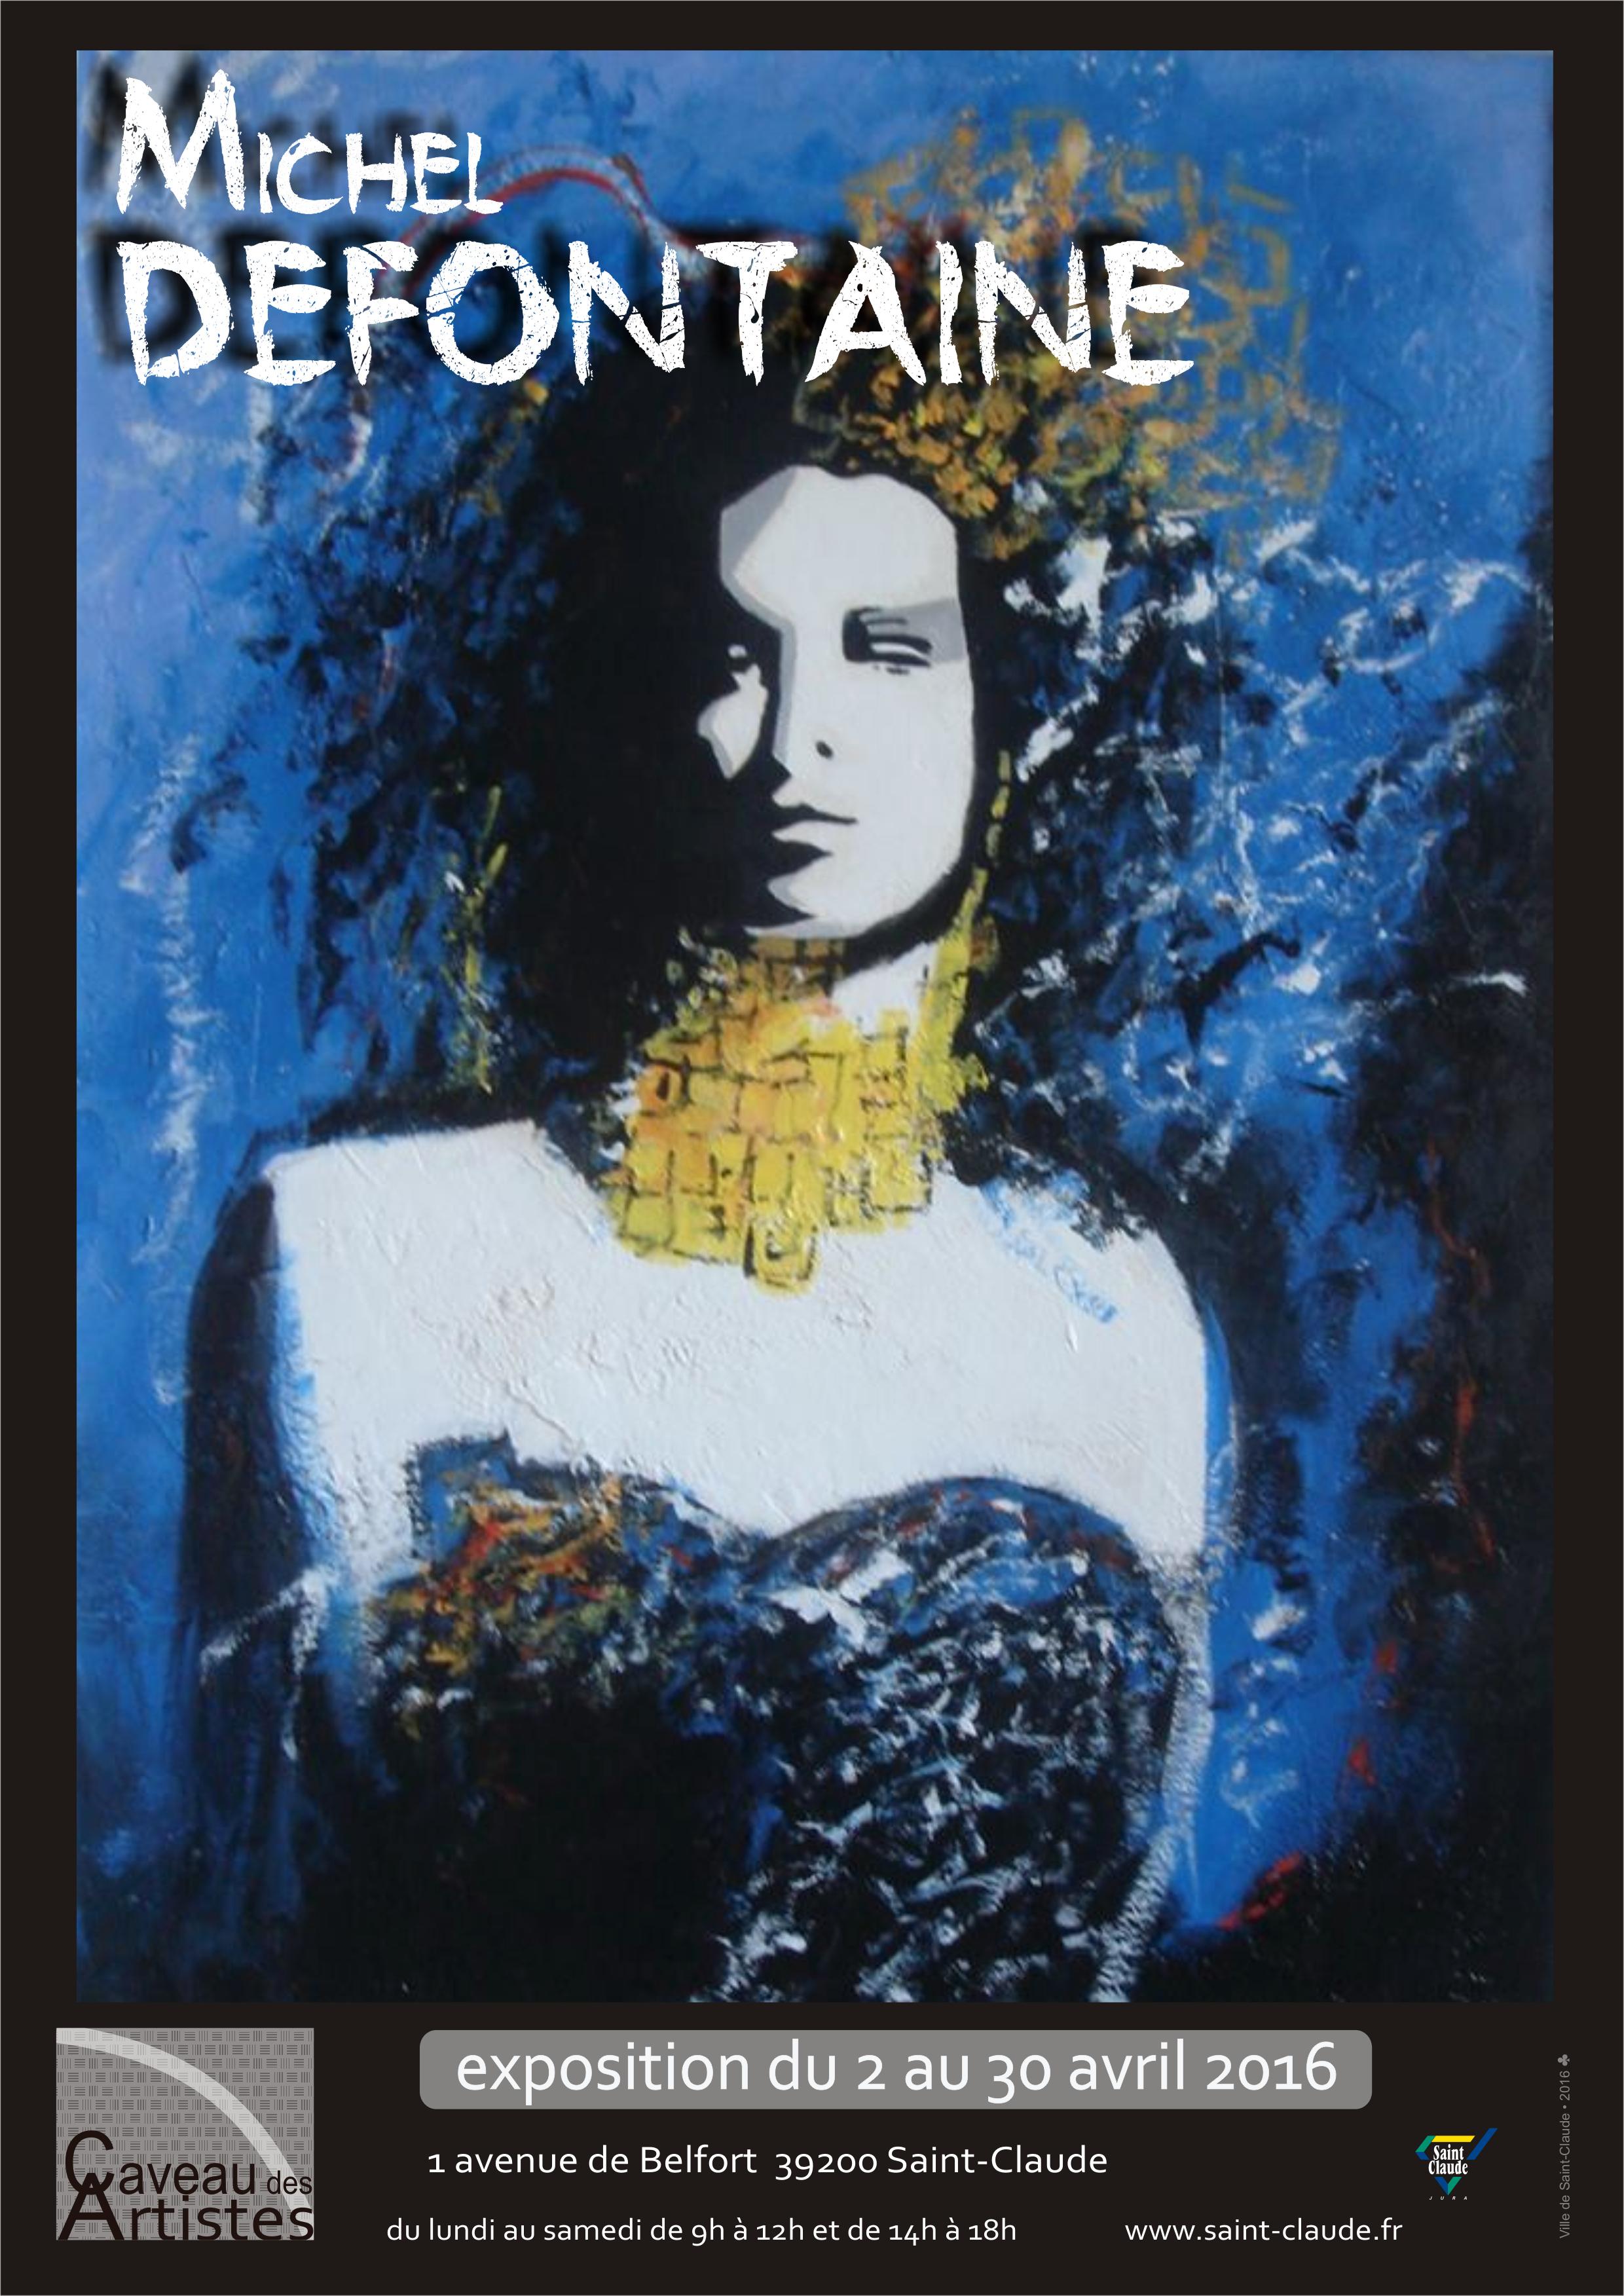 Exposition M. Defontaine - Affiche